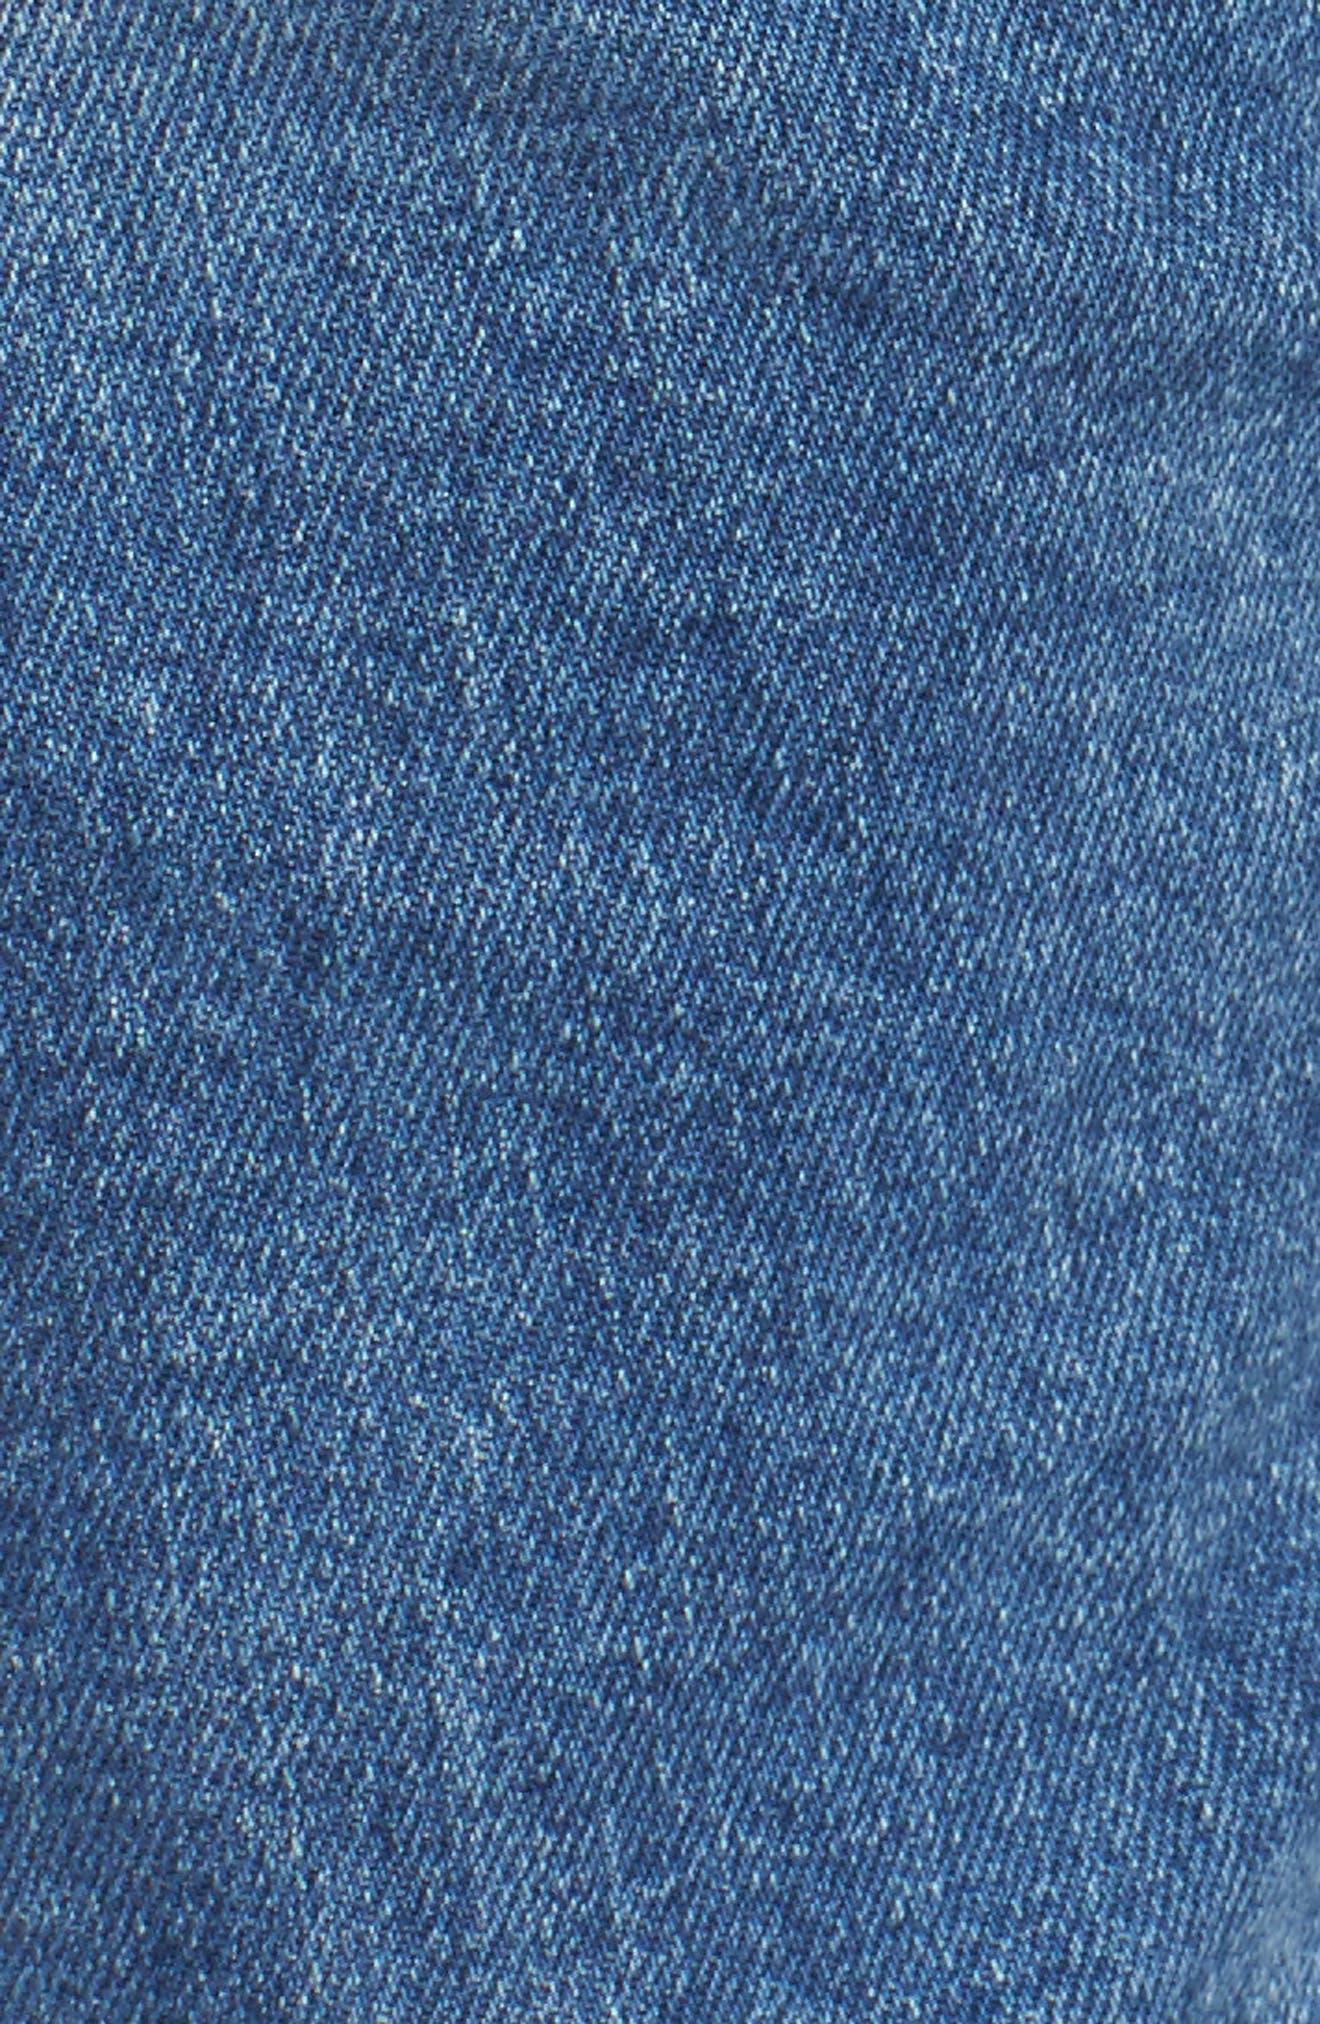 x Gigi Hadid Speed Distressed Ankle Zip Jeans,                             Alternate thumbnail 5, color,                             400